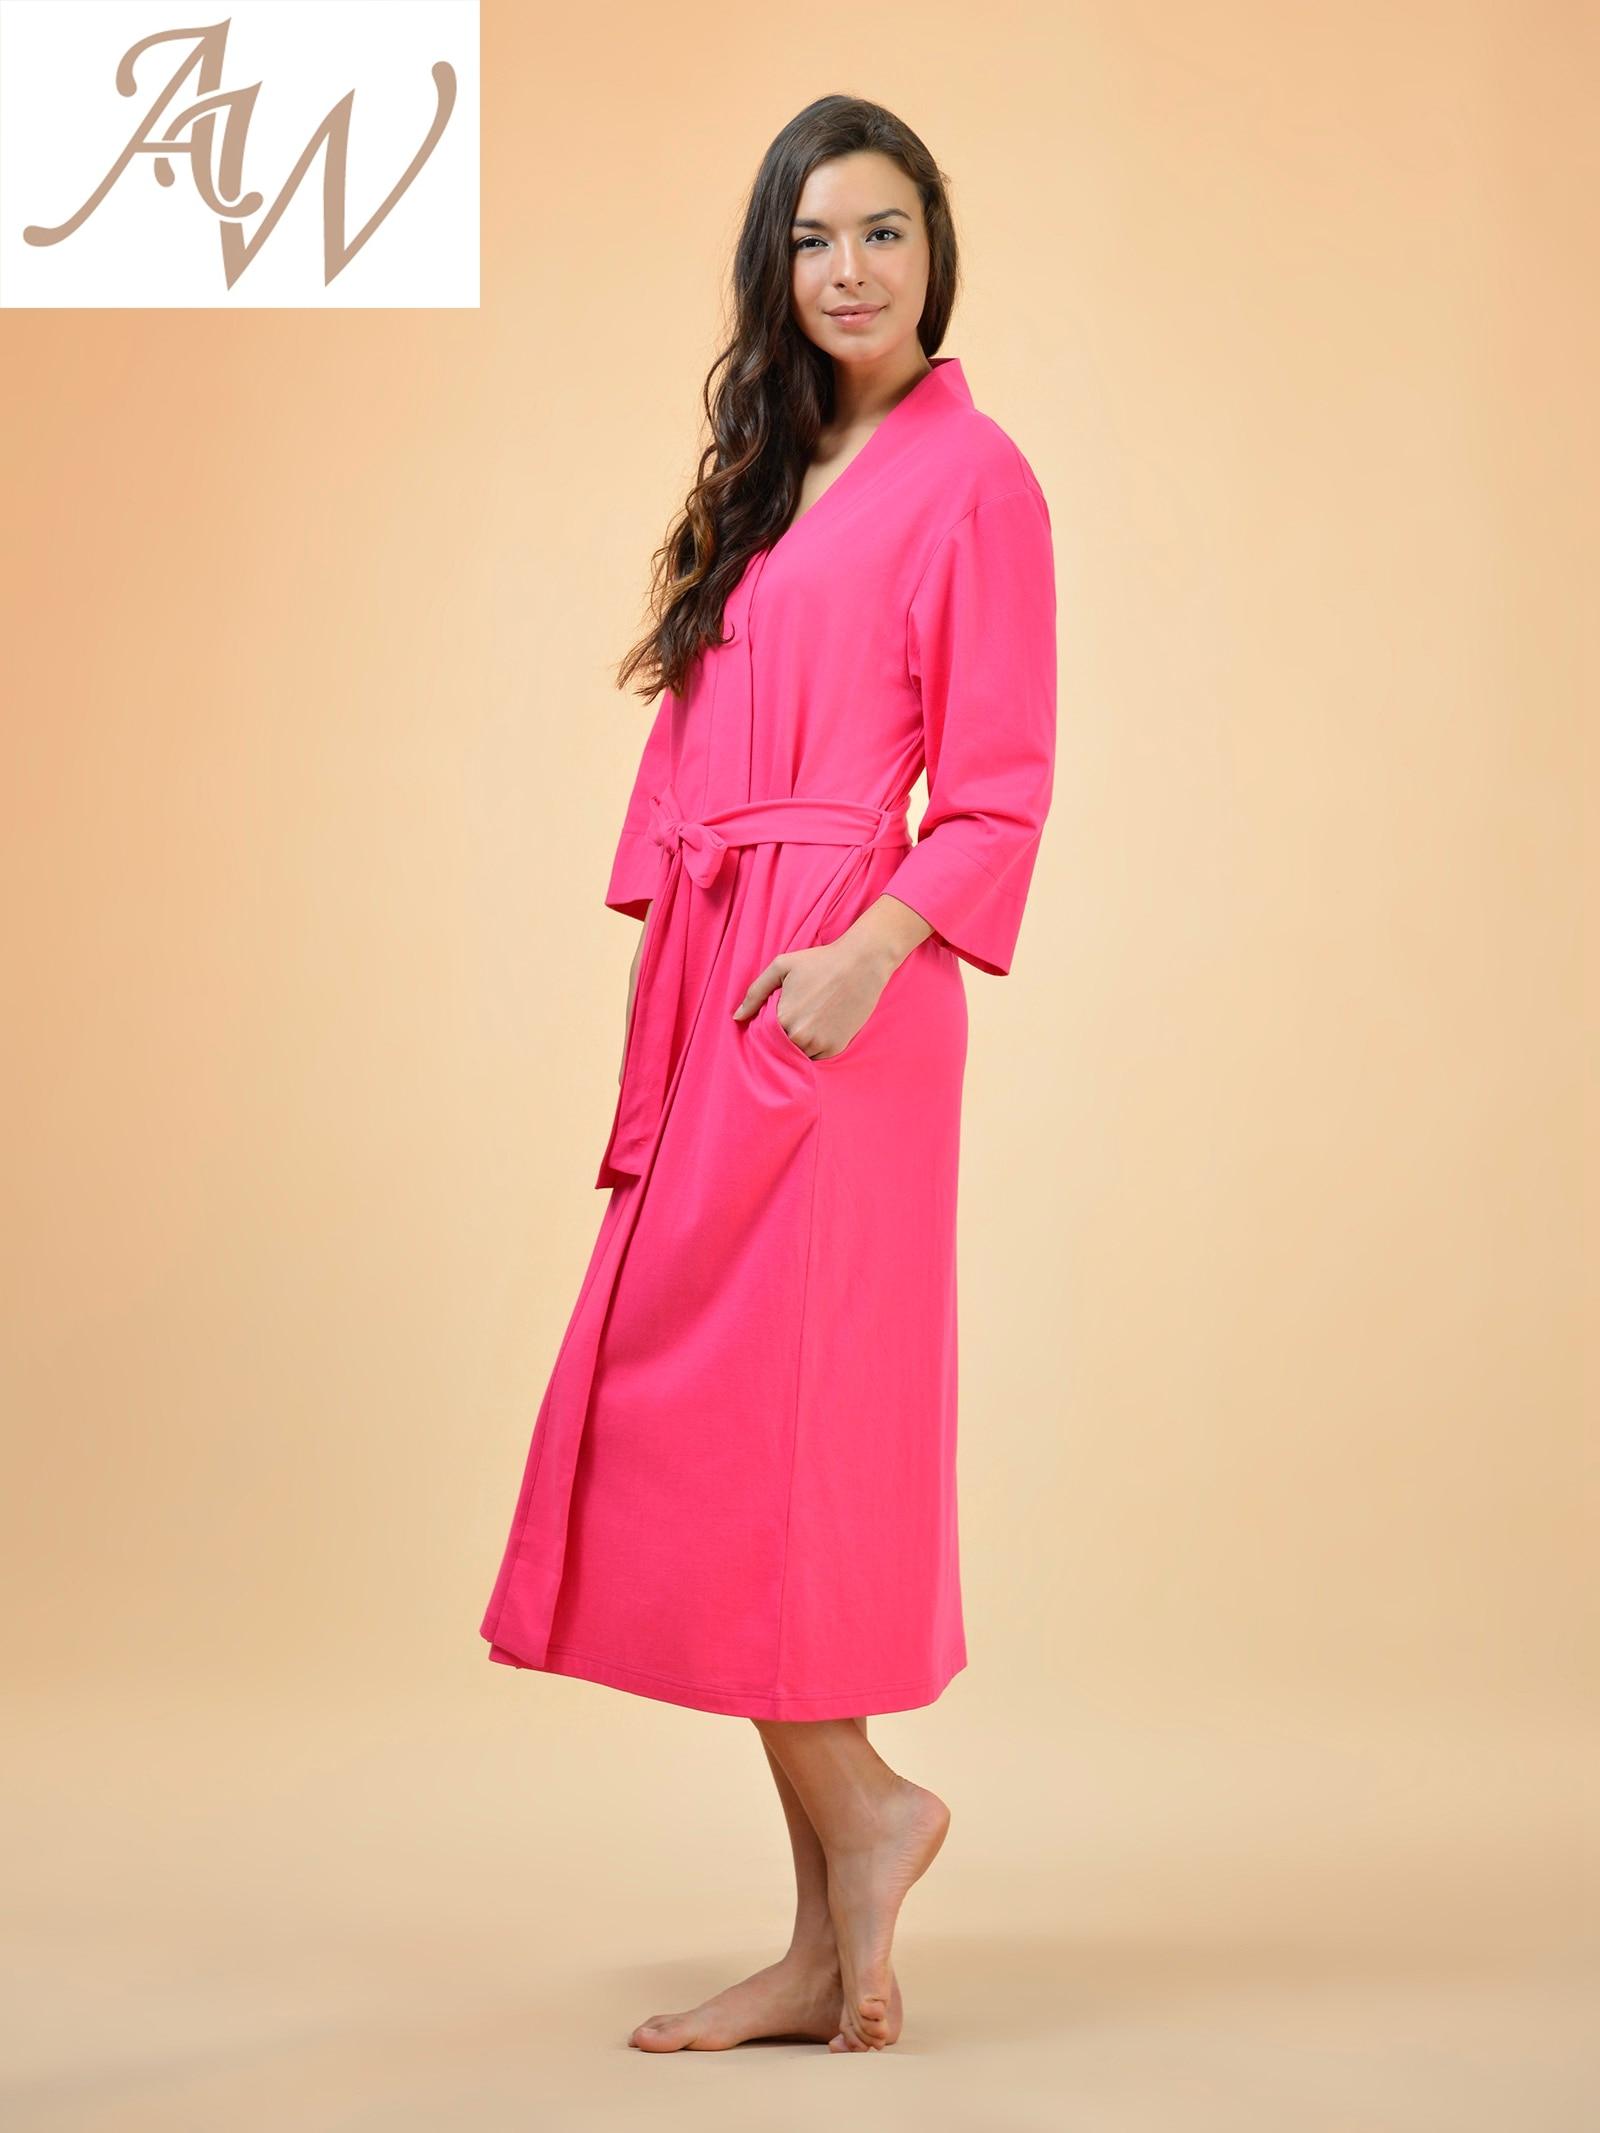 Cotton Robes Soft Kimono Robe Long Knit Bathrobe Nightwear Lightweight  Loungewear Nightdress V neck Sexy Sleepwear for women-in Robes from  Underwear ... 517bda48b